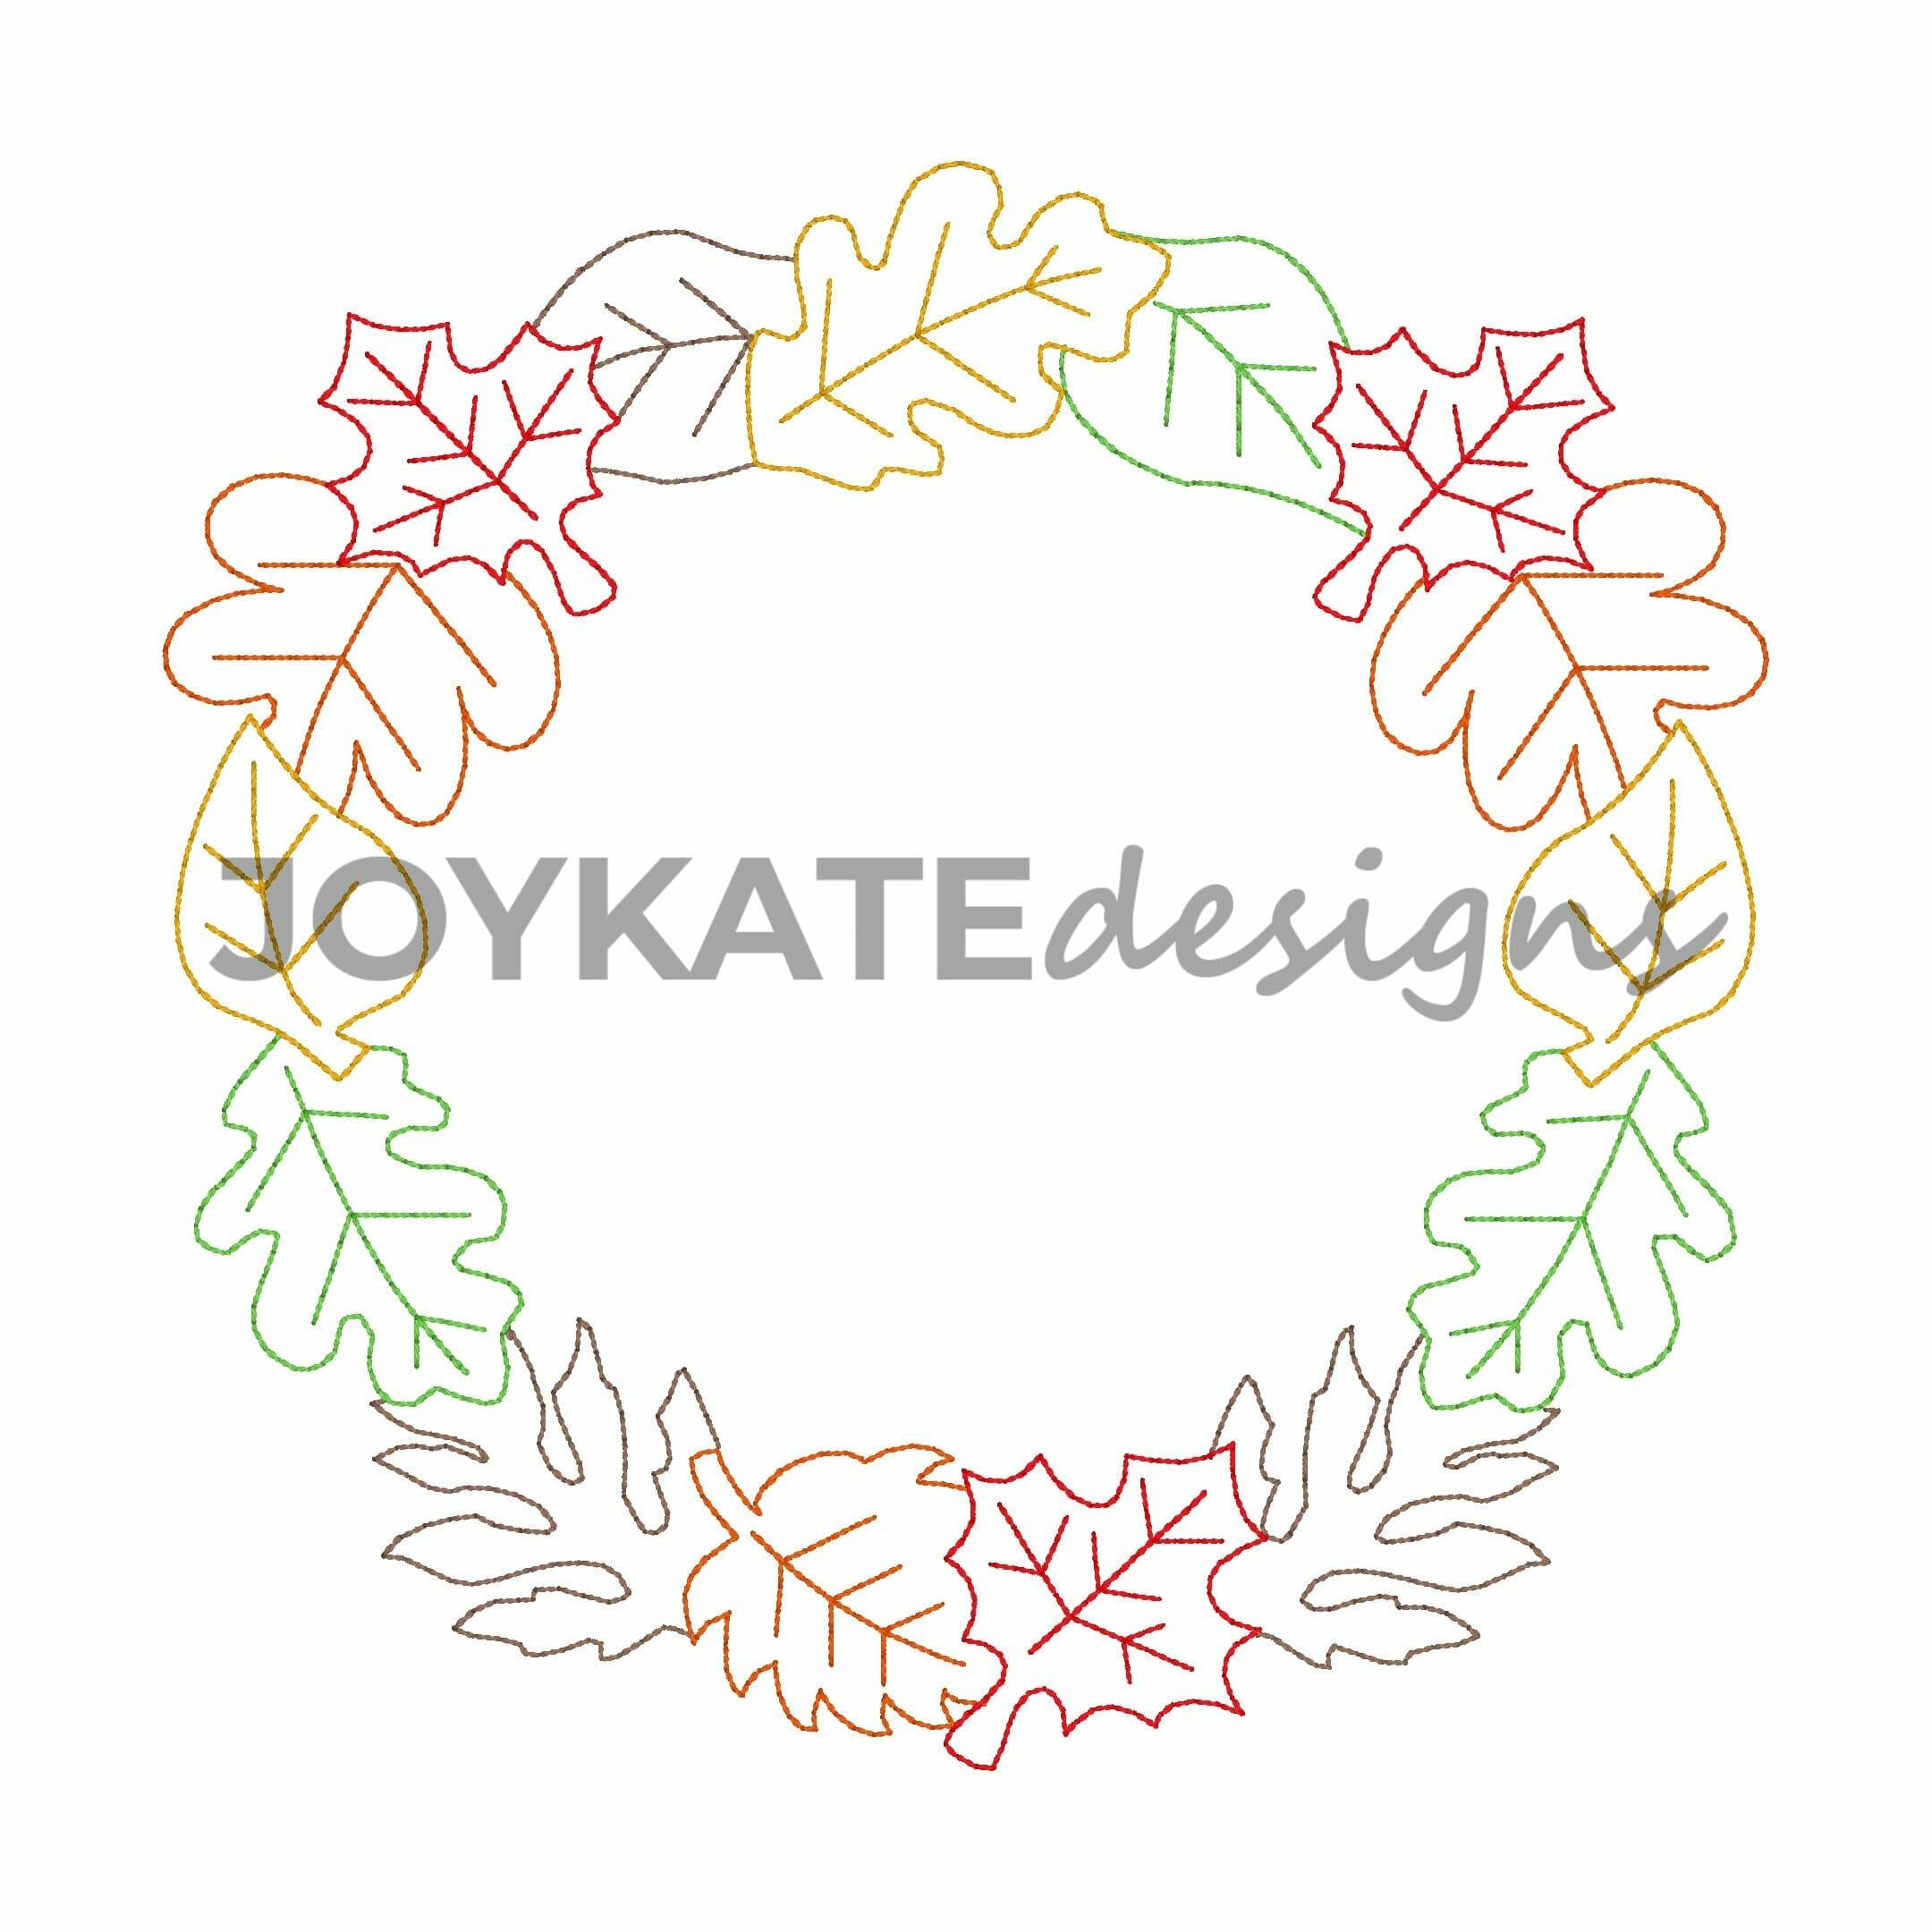 Vintage Bean Stitch Fall Leaf Frame Embroidery Design Joy Kate Designs